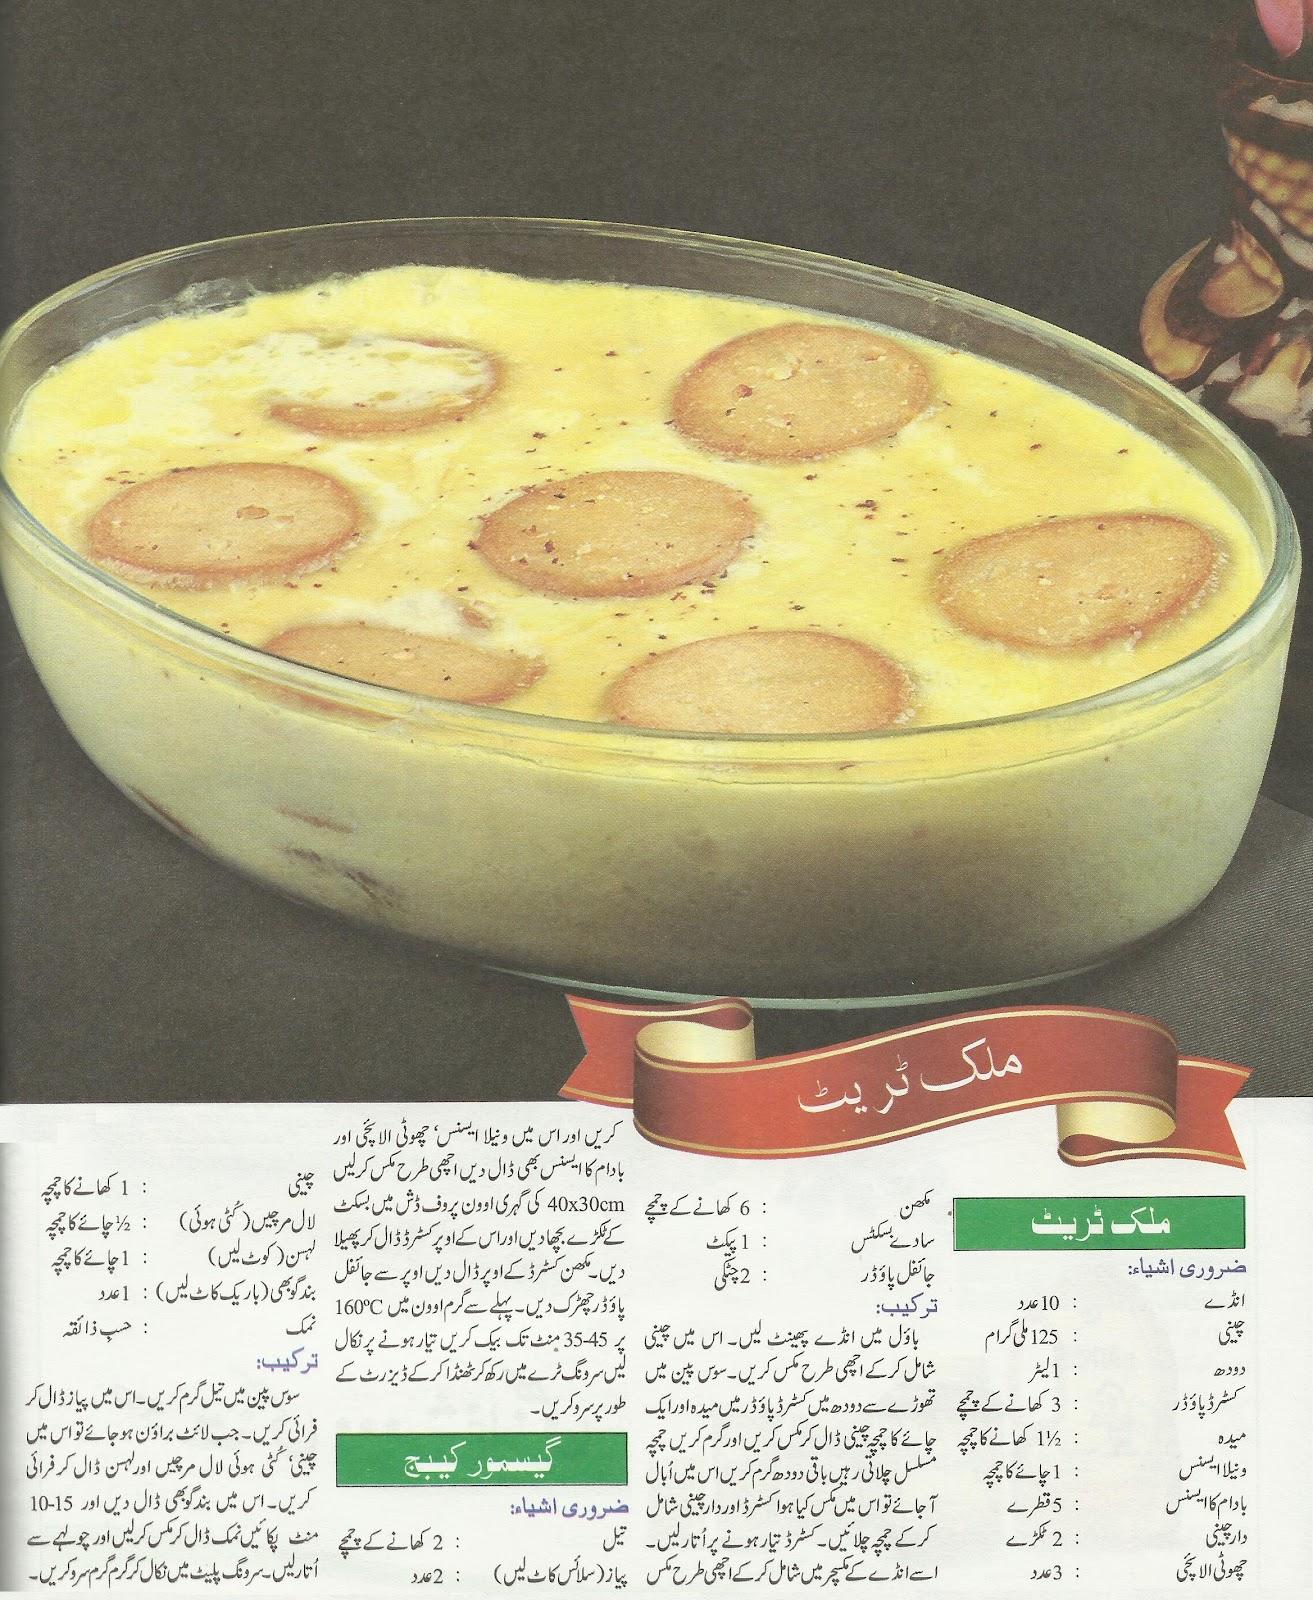 Coking Philospher New Coking Recipes In Urdu 2012 Milk Treat A